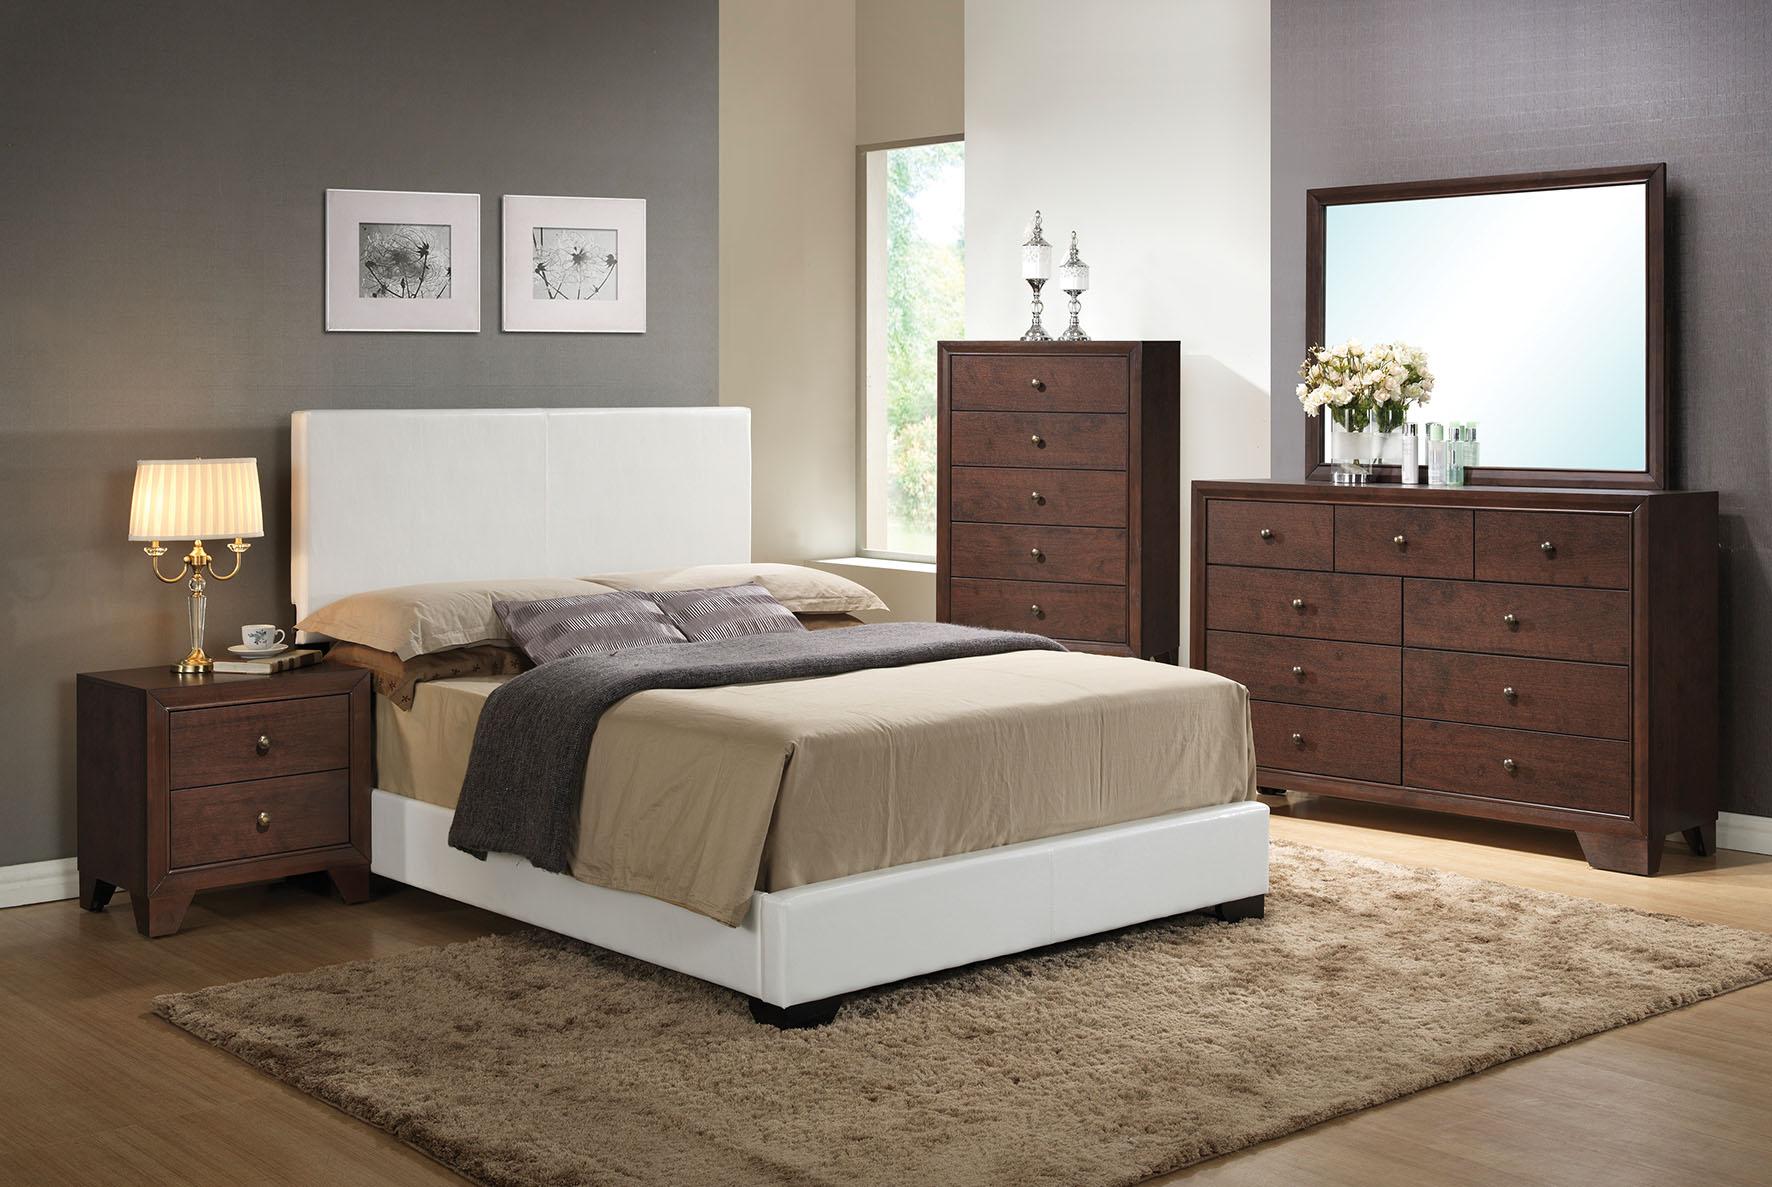 Full Bed (Panel), White Pu